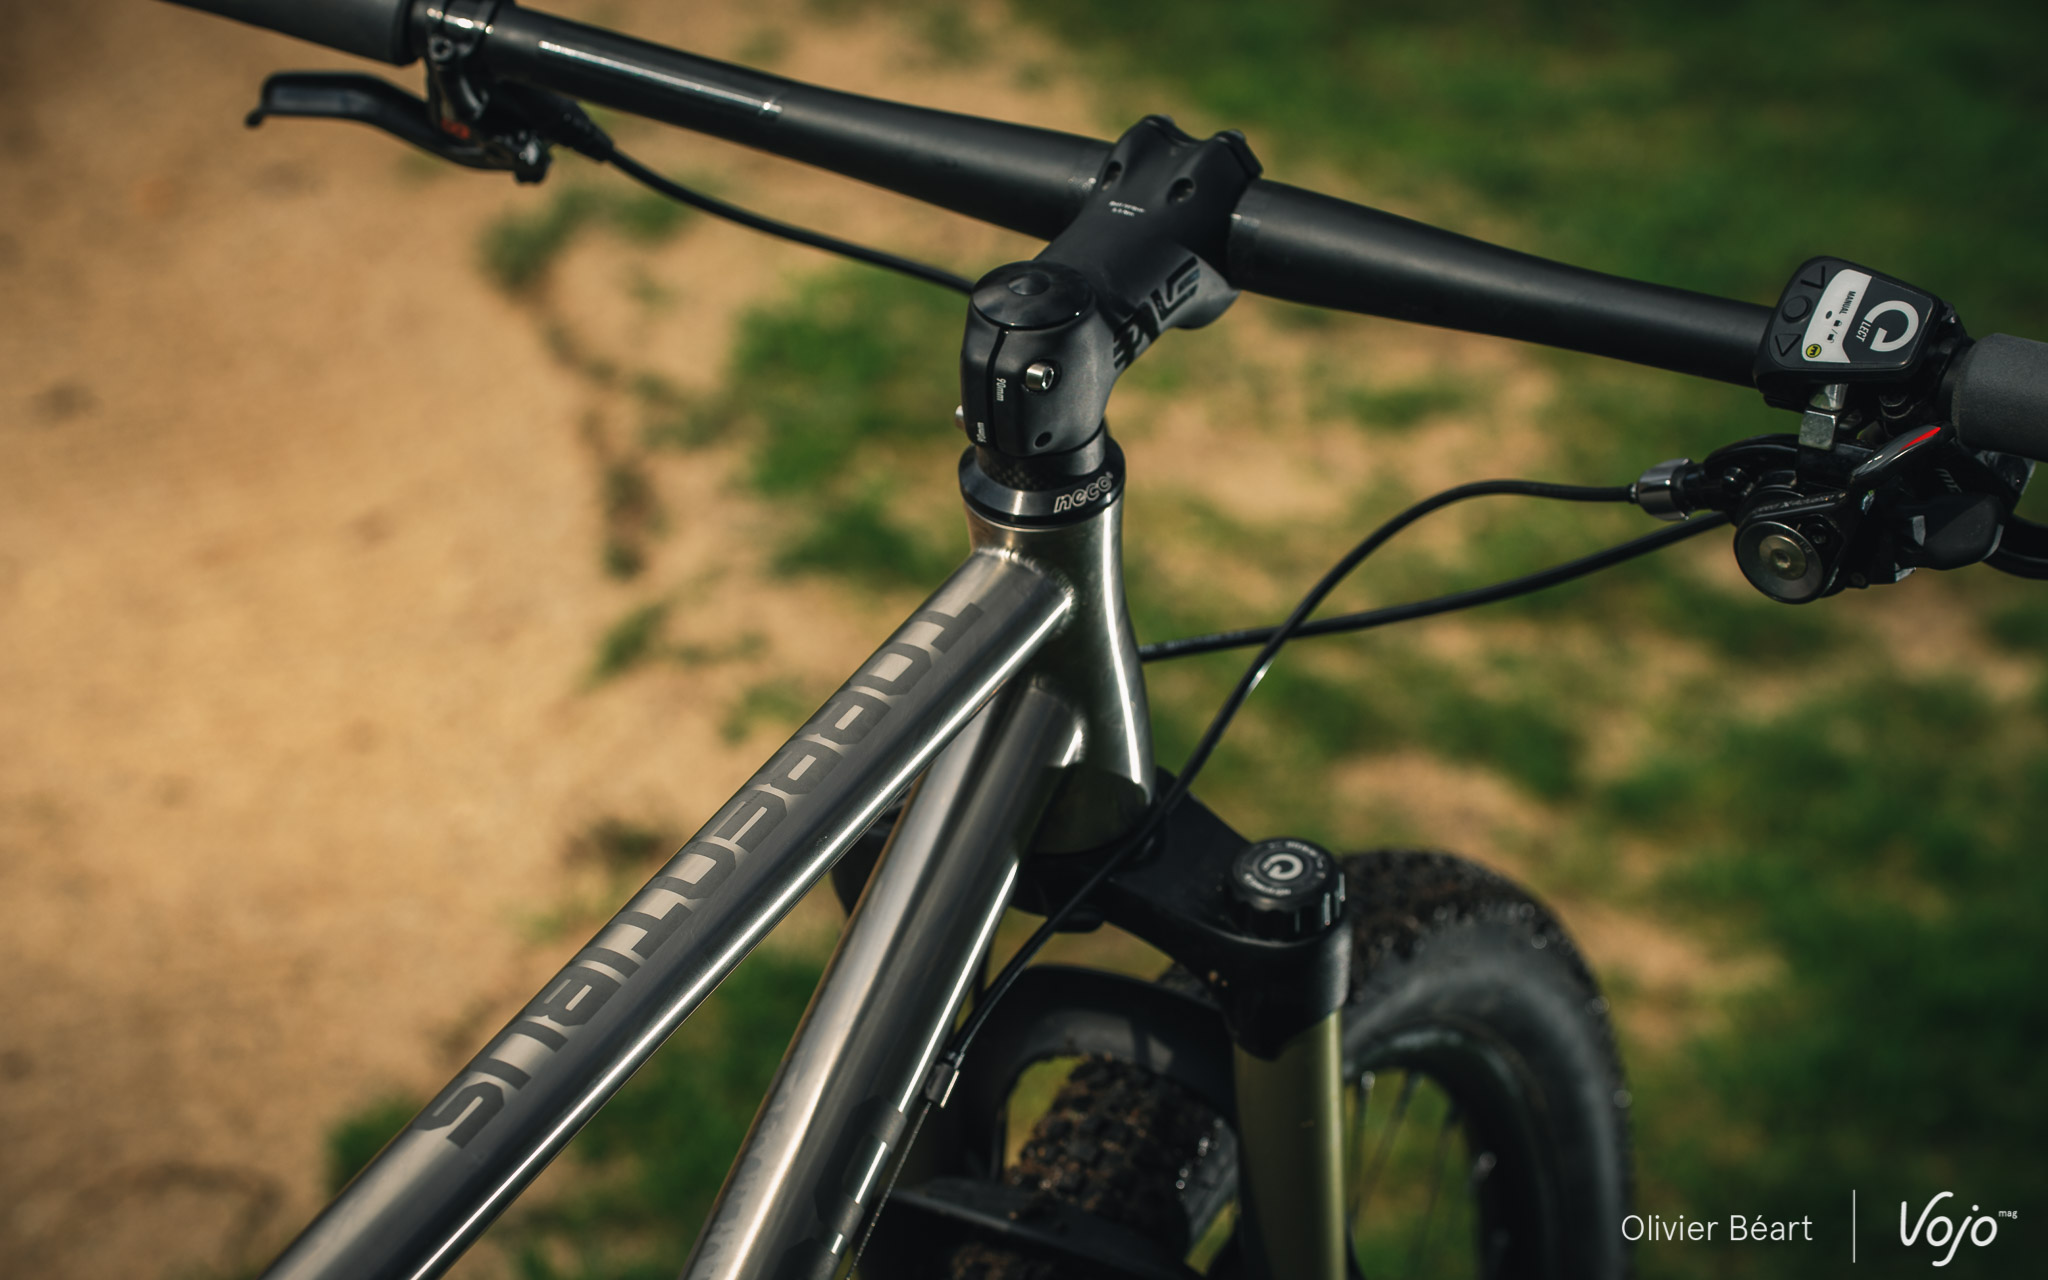 cycles_leon_decouverte_copyright_obeart_vojomag-12